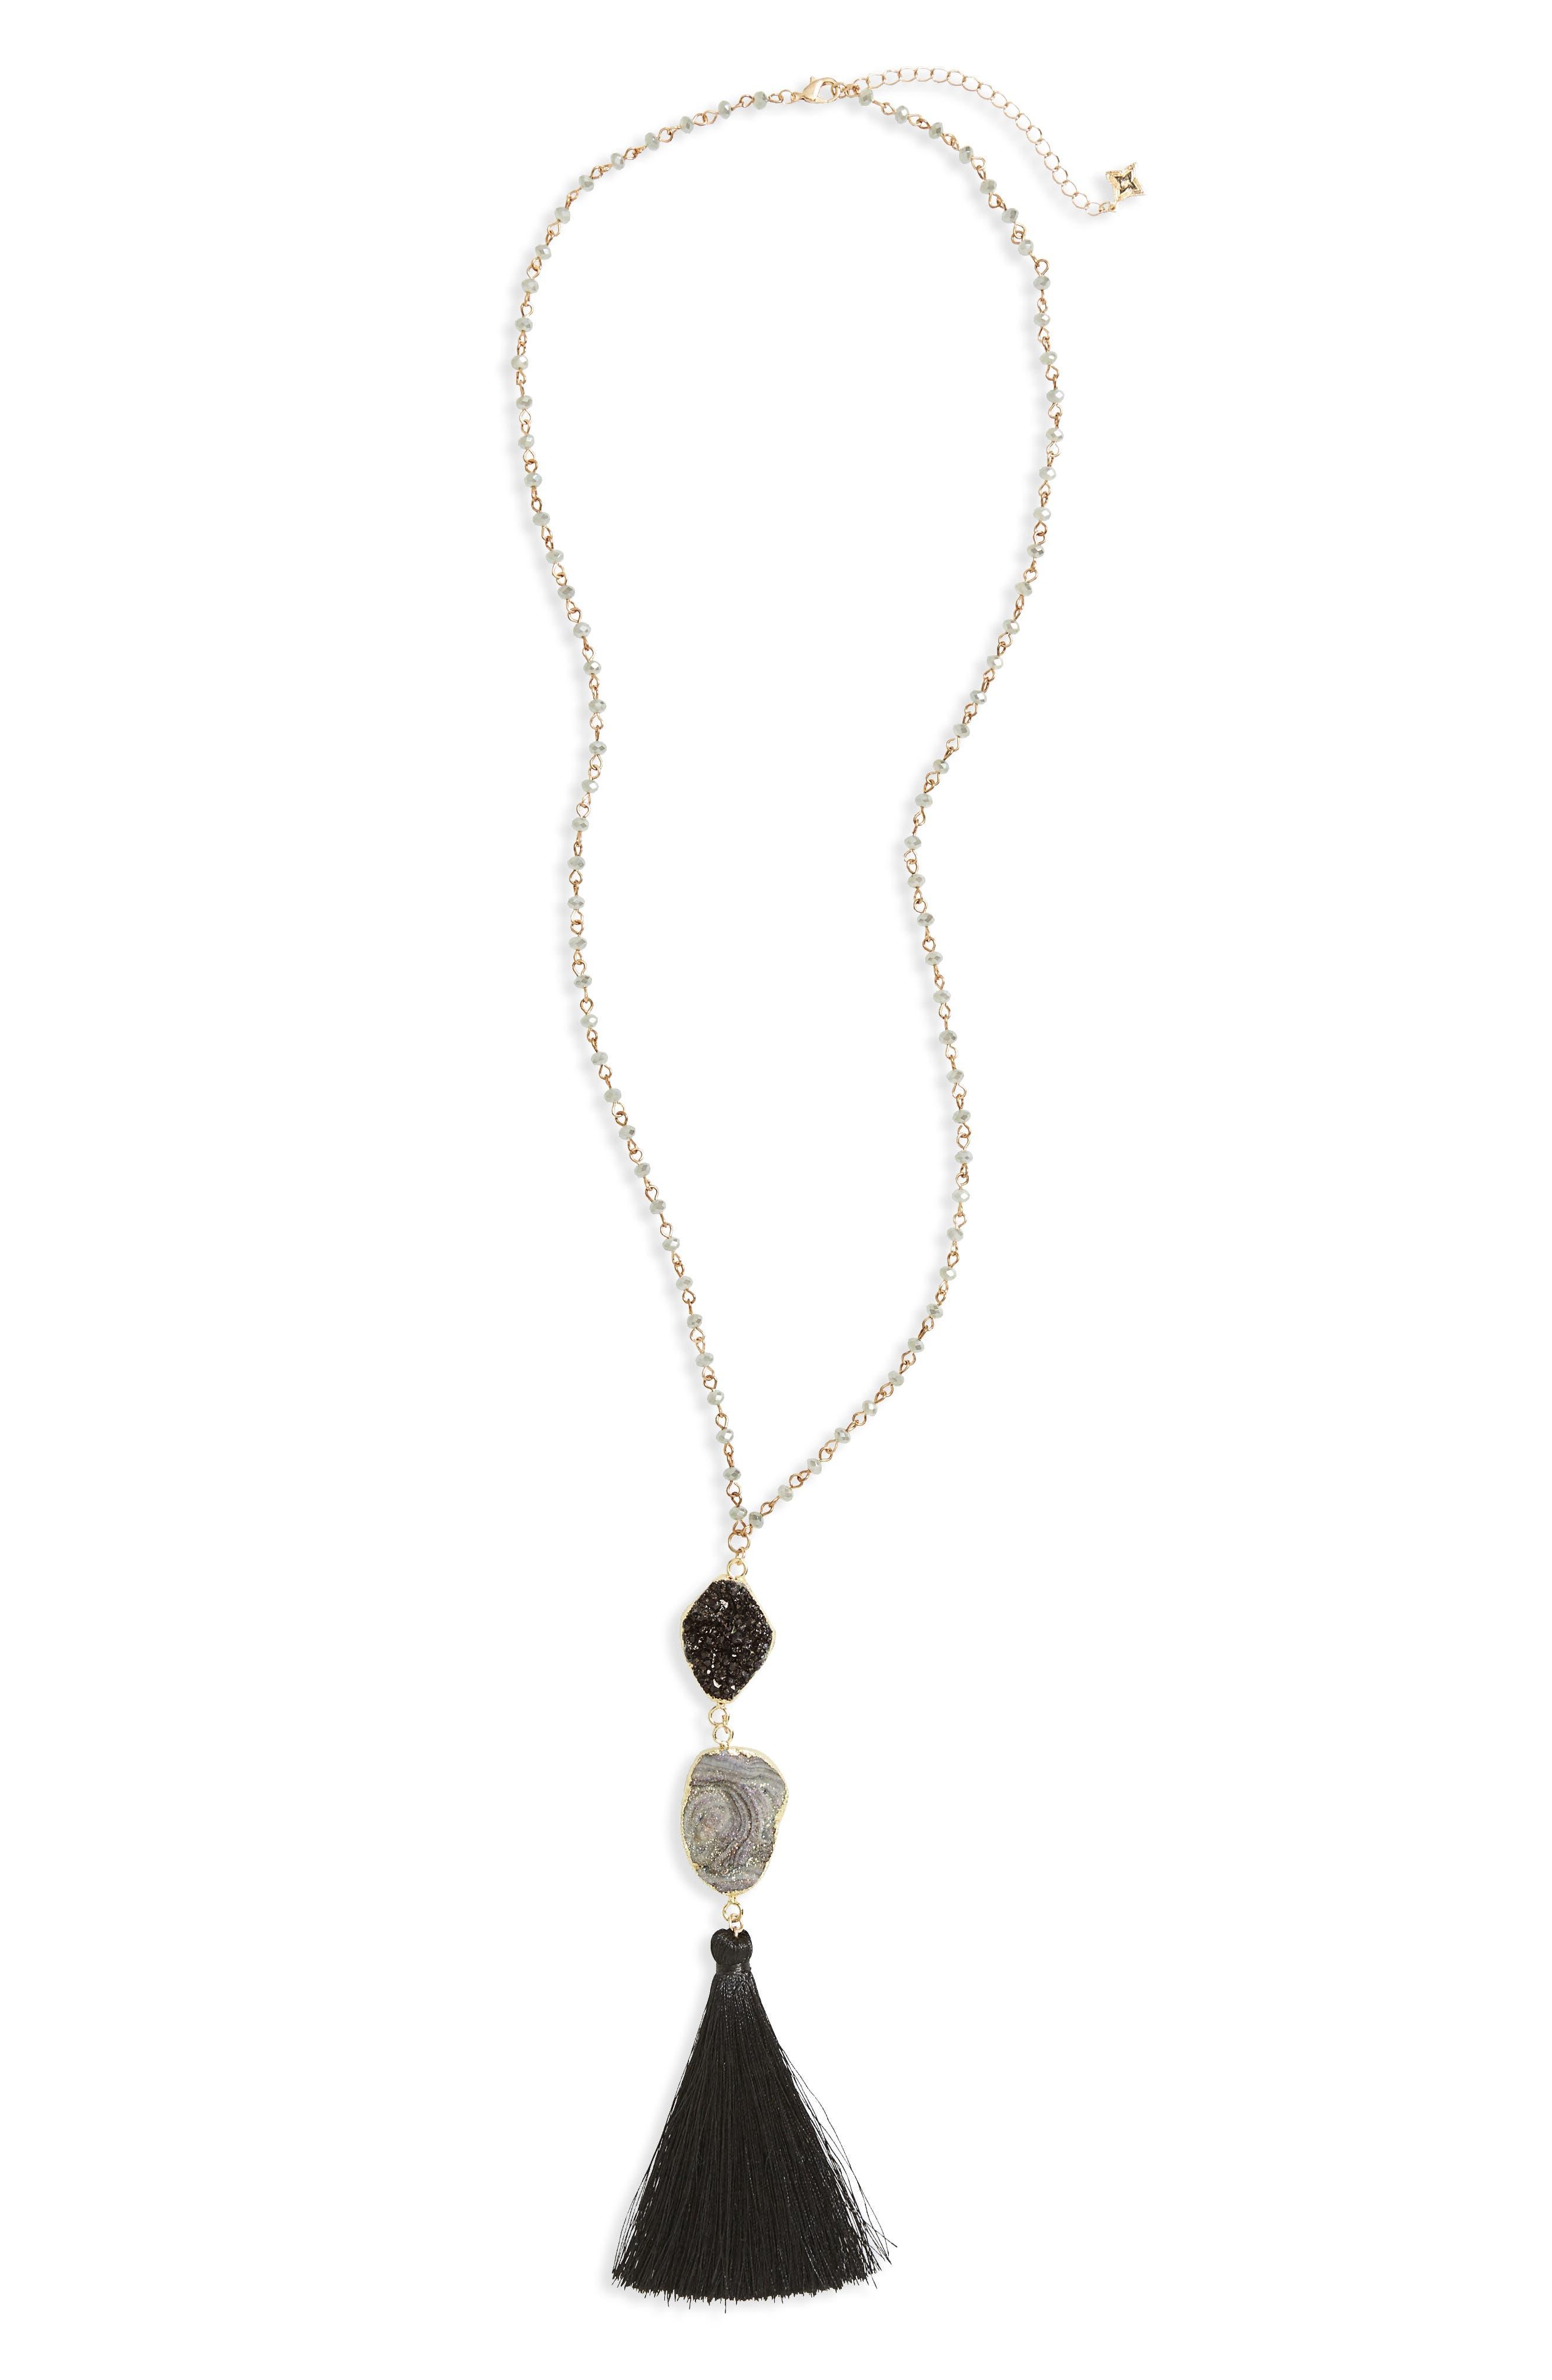 Drusy Tassel Pendant Necklace,                             Main thumbnail 1, color,                             020